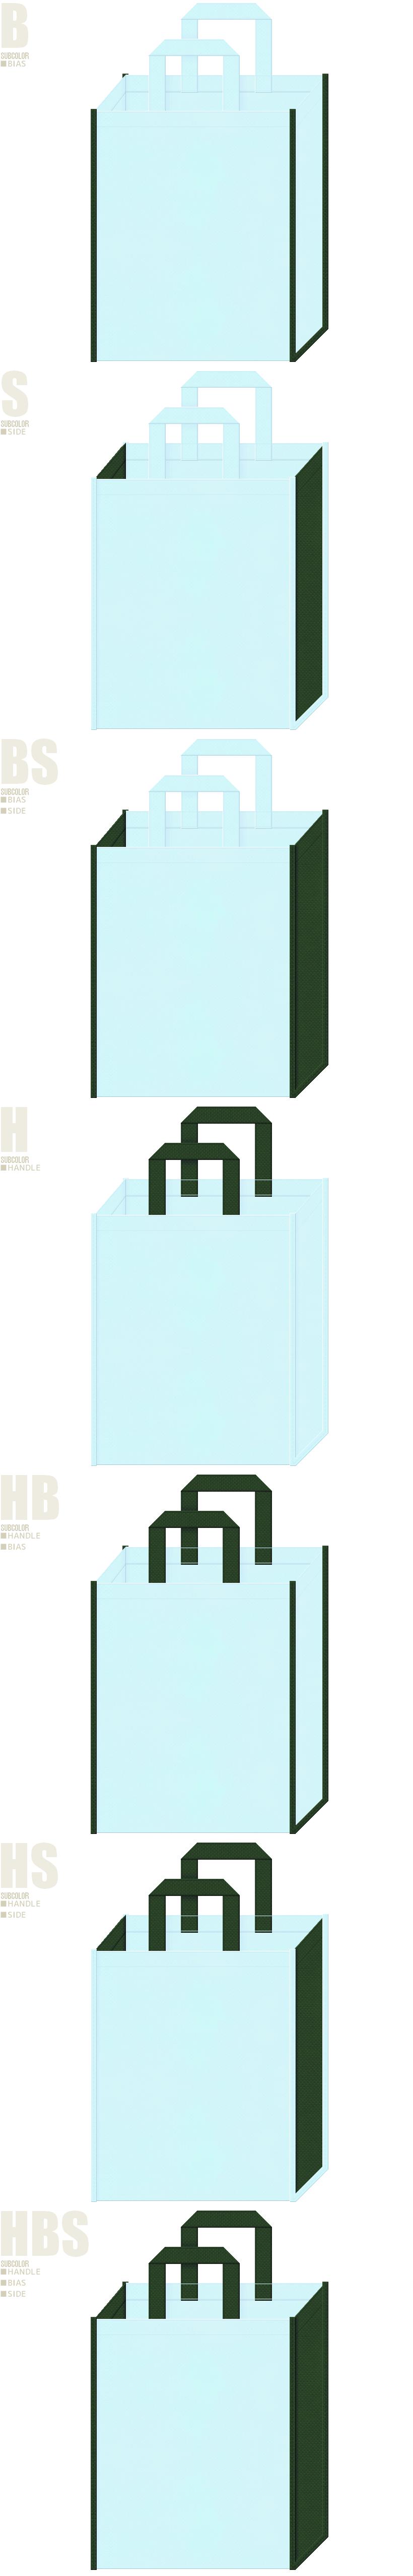 CO2削減・地球温暖化・環境イベント・医療機器・医薬品の展示会用バッグにお奨めの不織布バッグデザイン:水色と濃緑色の配色7パターン